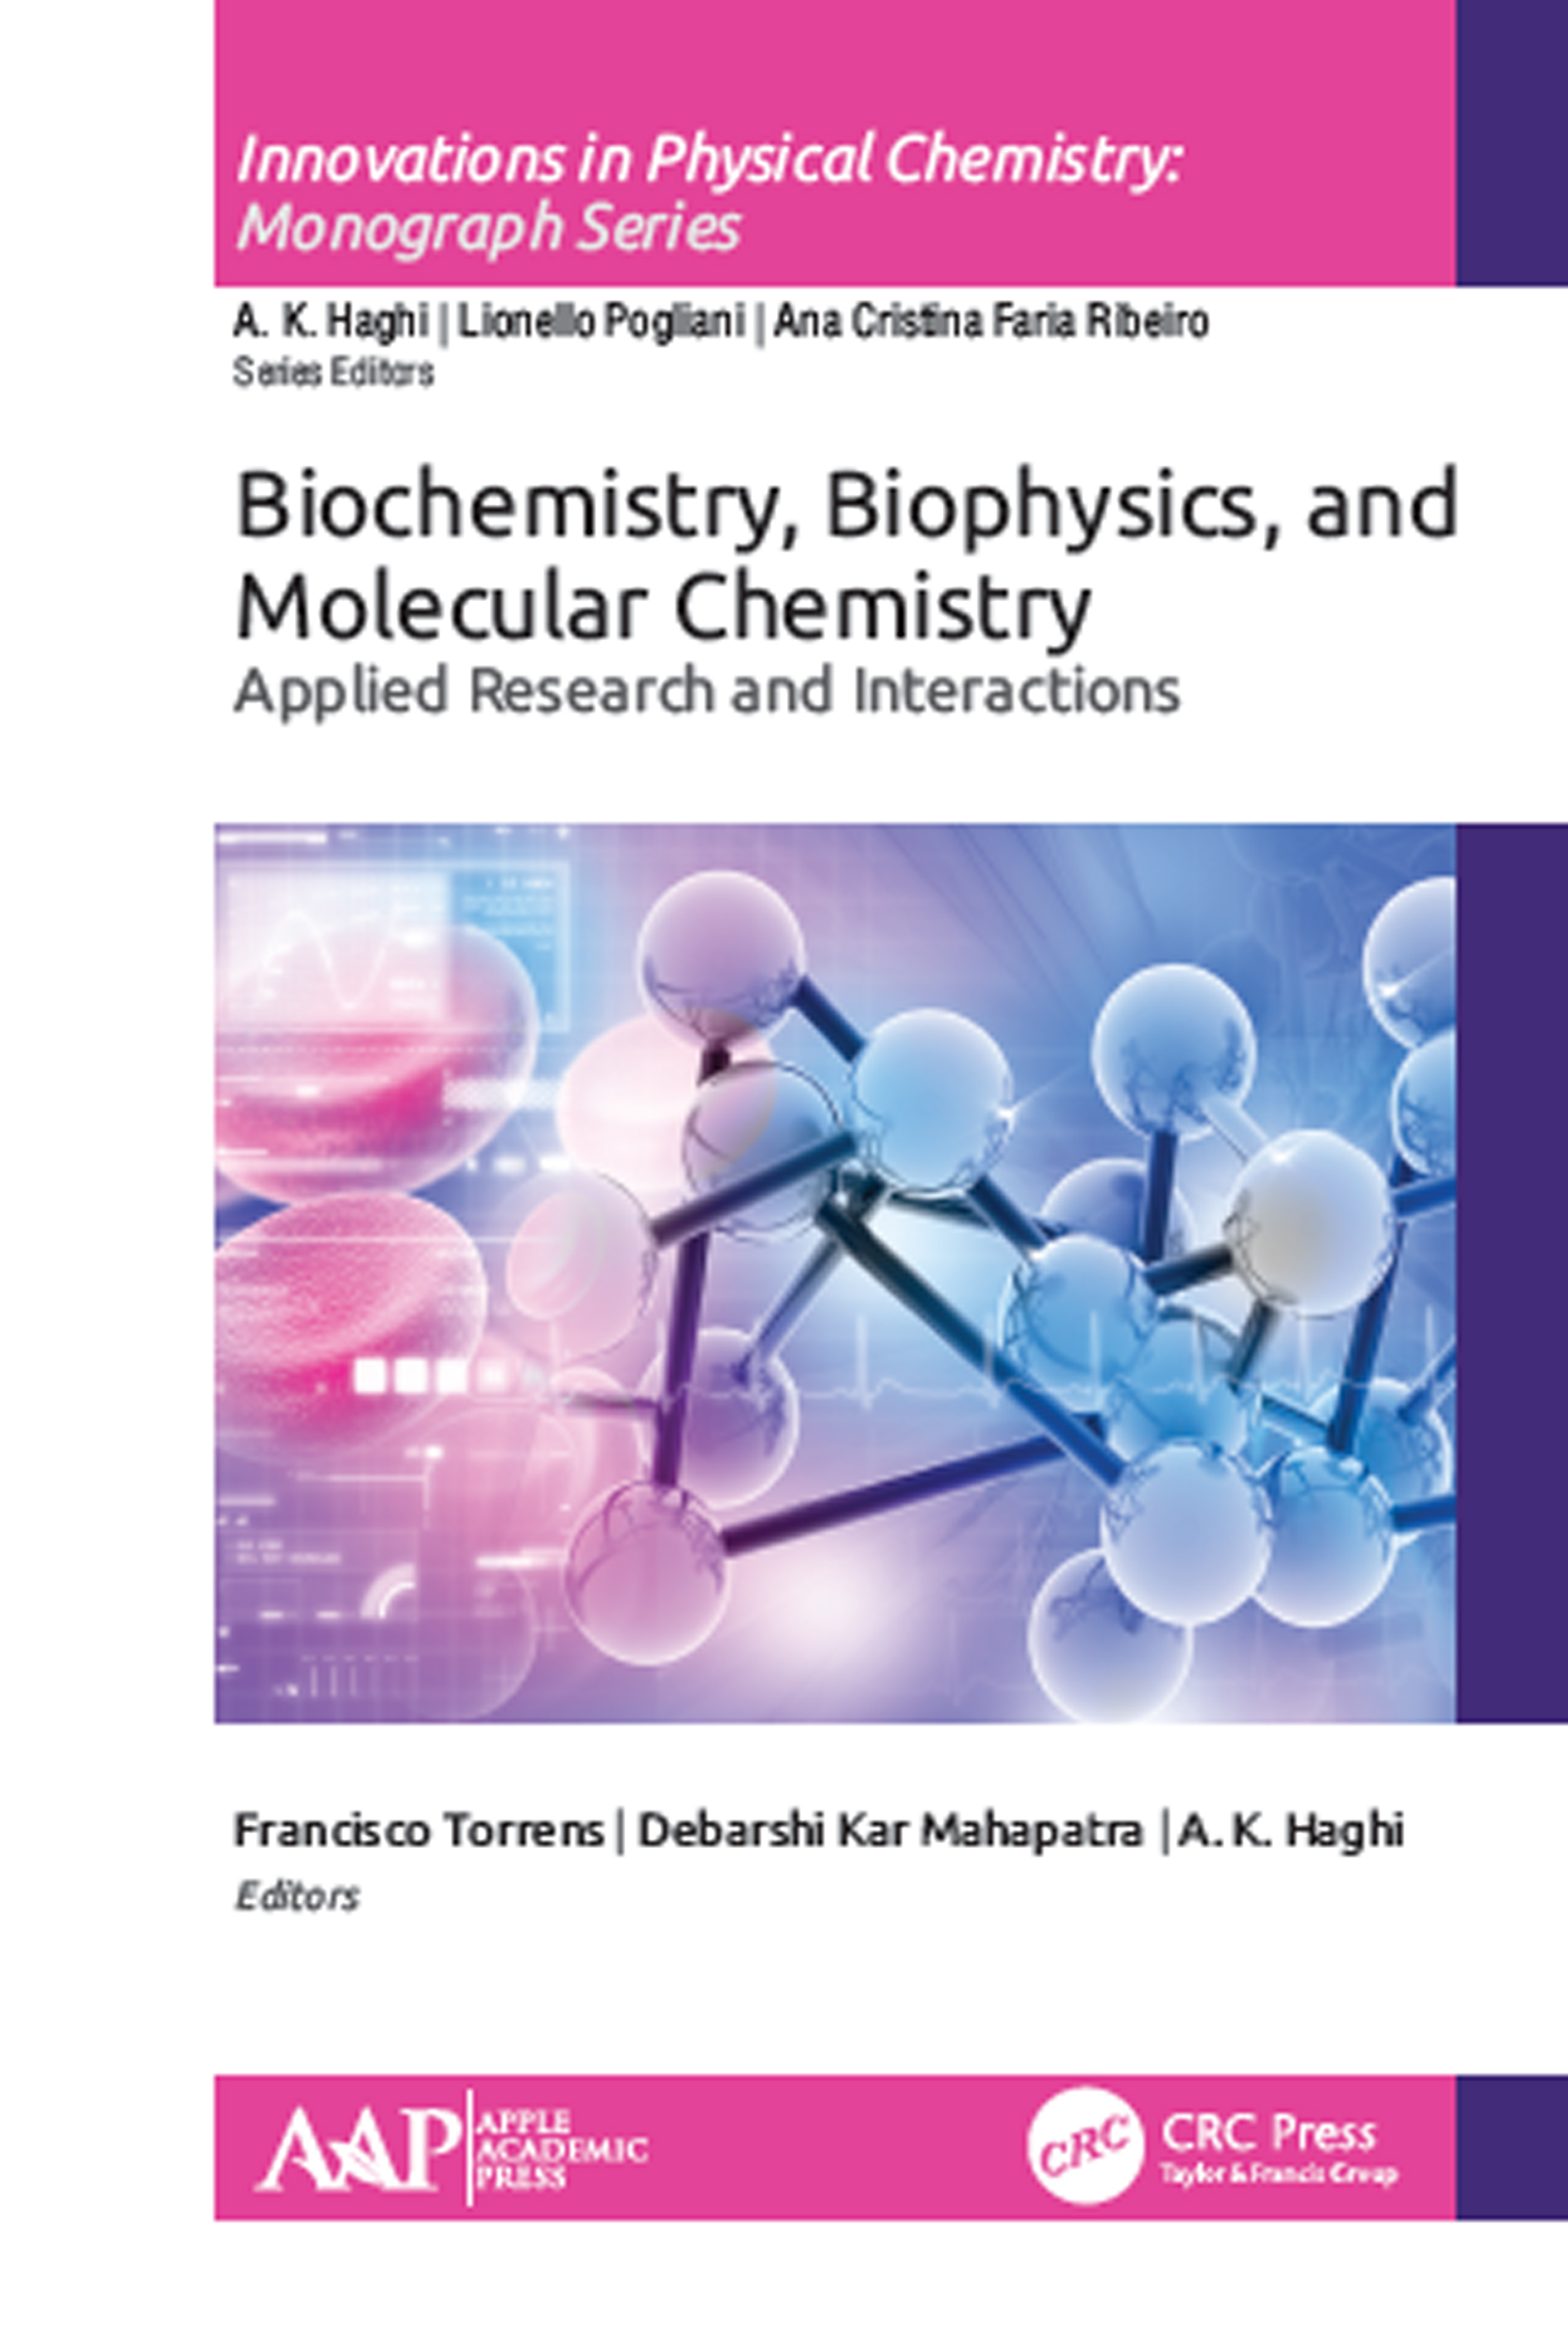 Biochemistry, Biophysics, and Molecular Chemistry